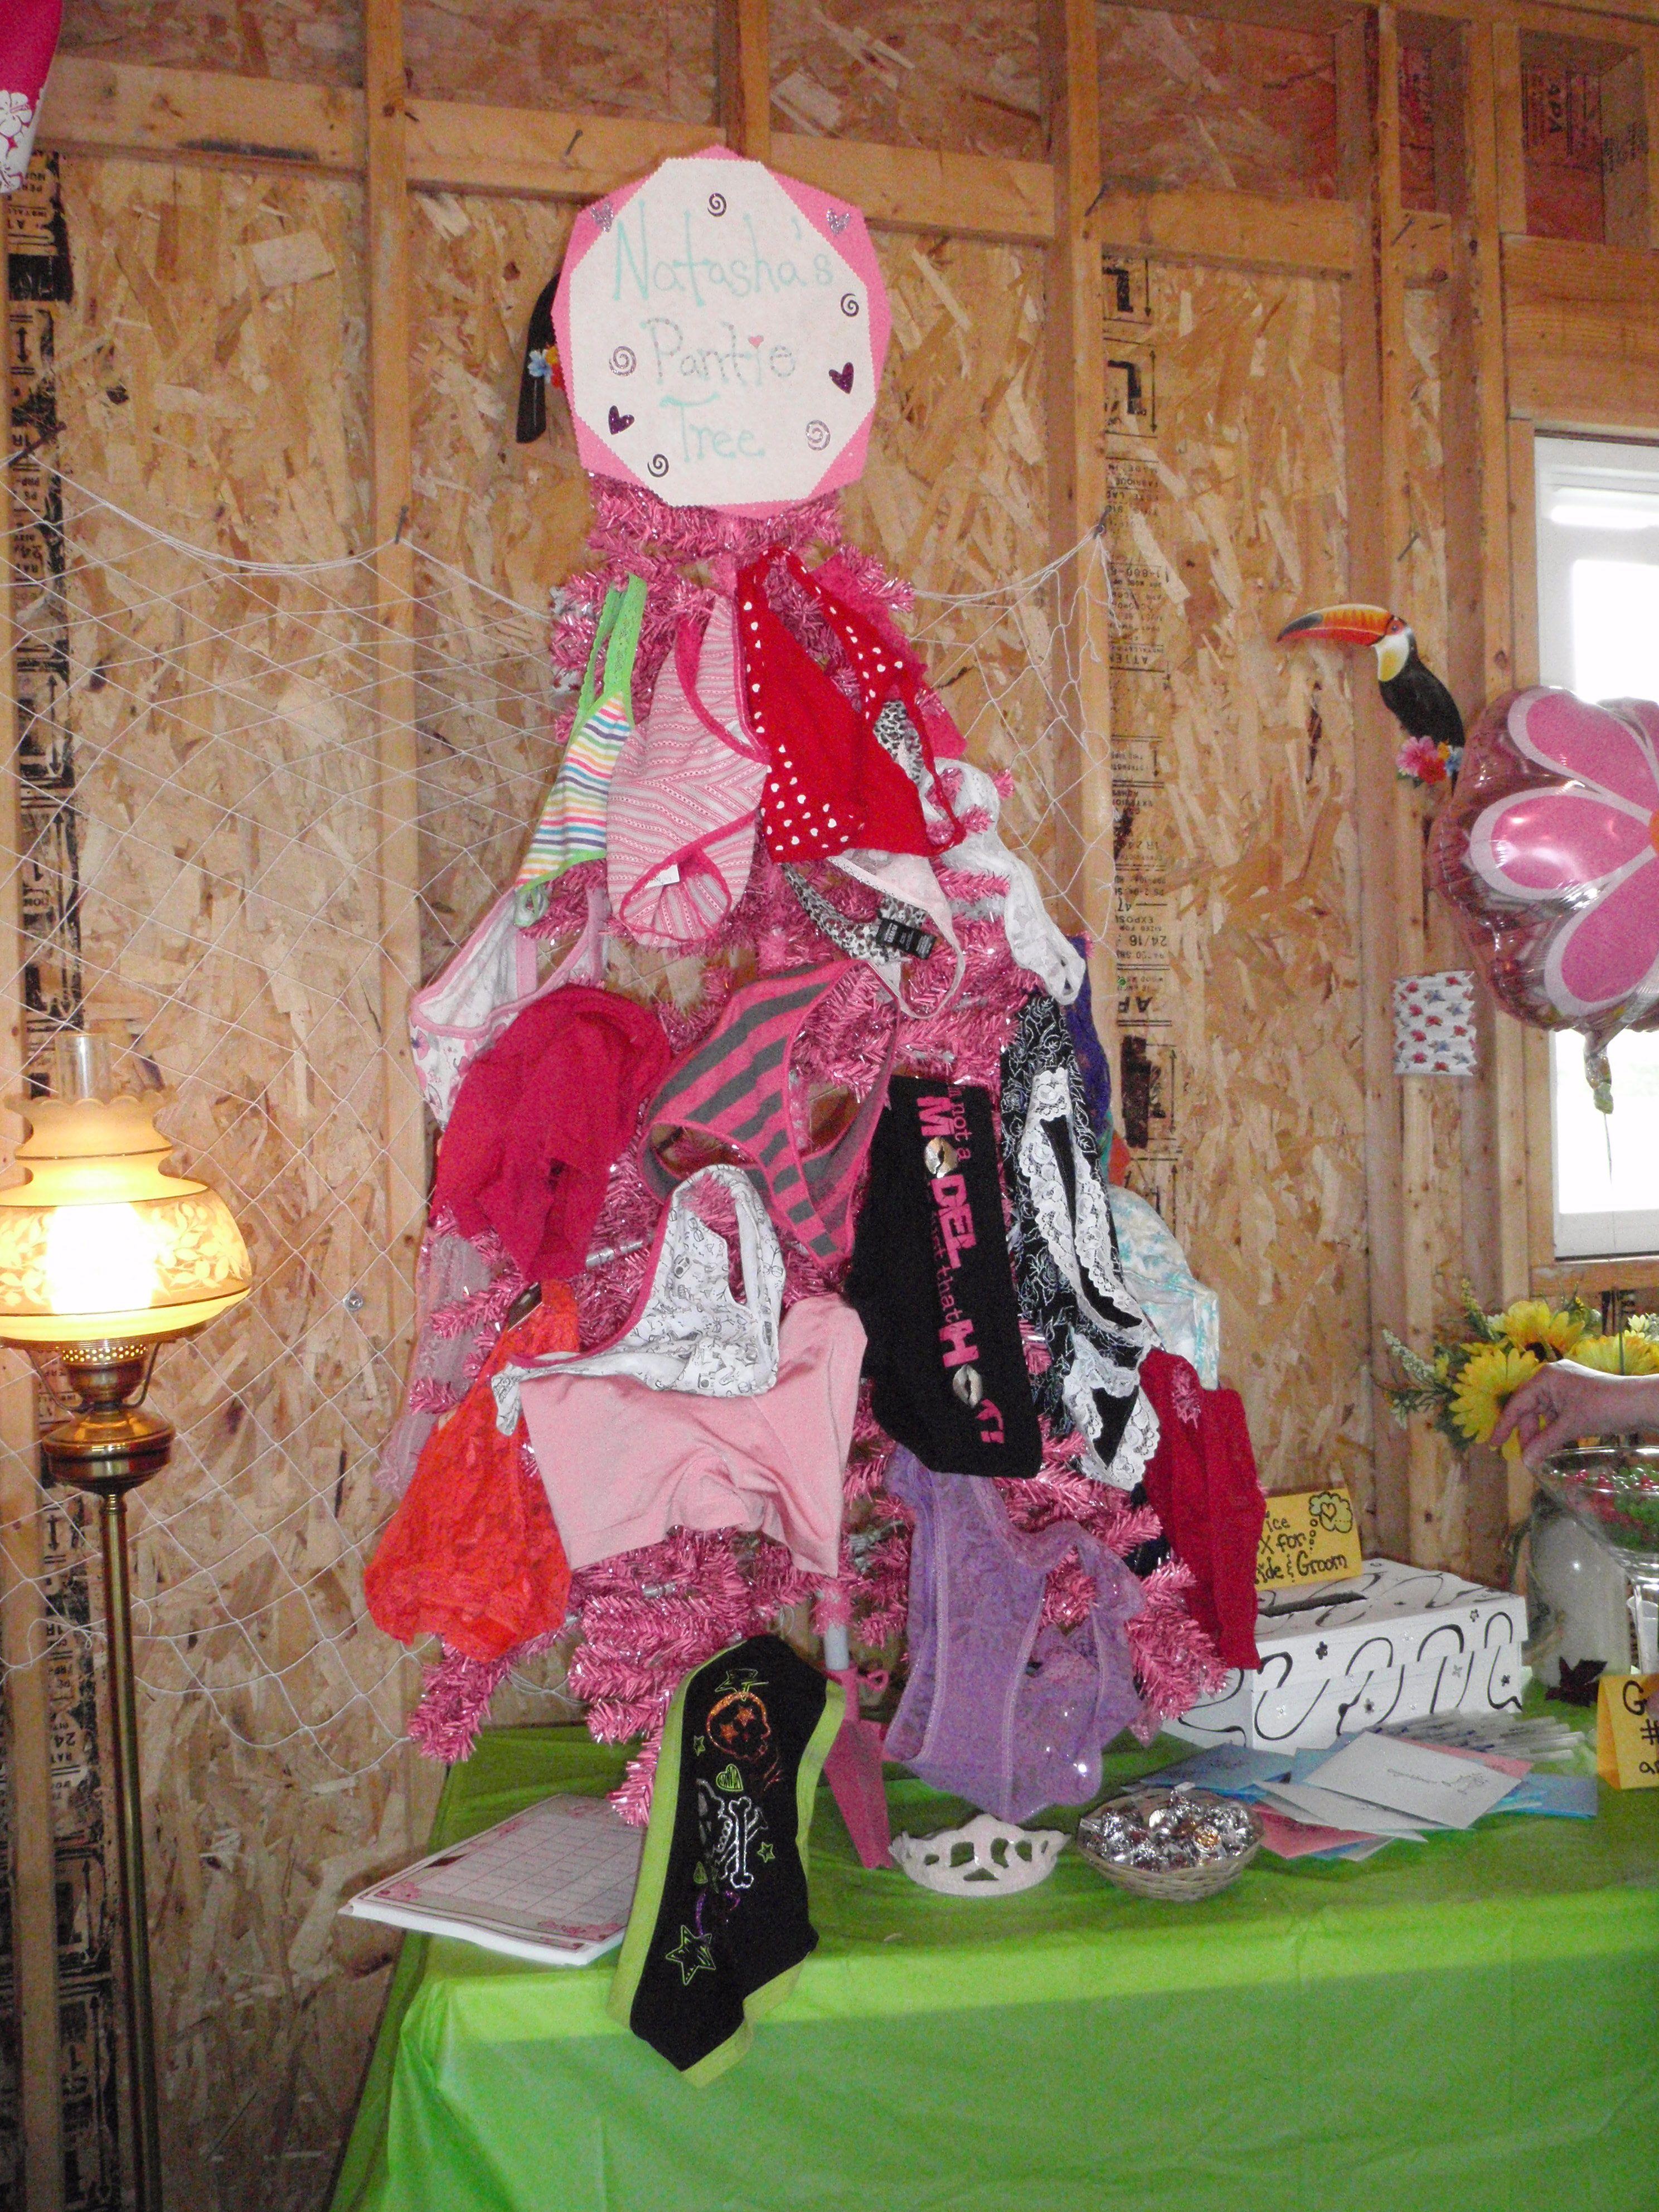 Bridal shower panty tree My bridesmaids had guests each bring a